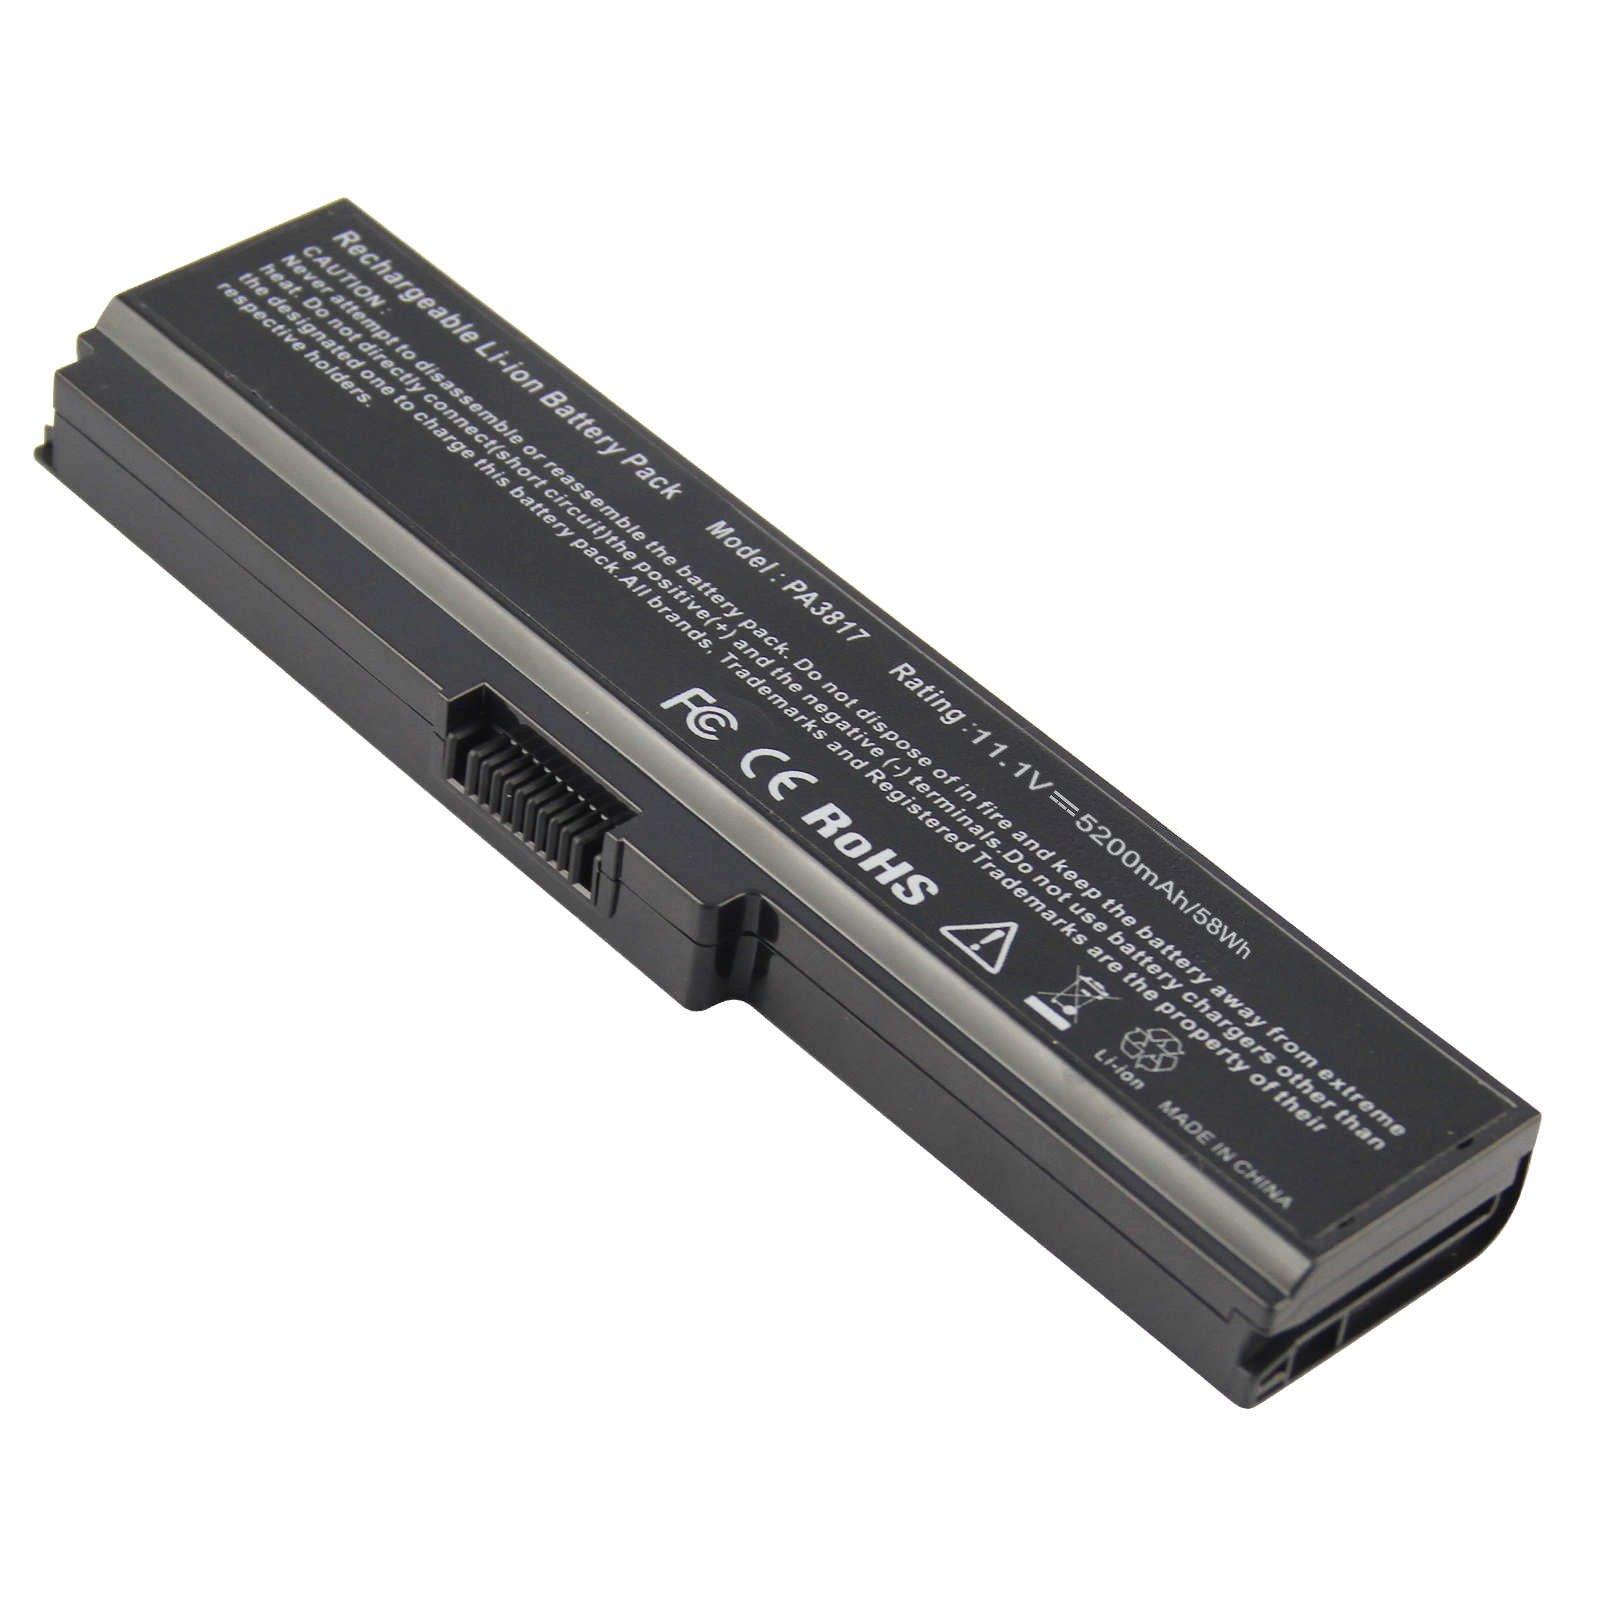 Bateria Para Toshiba Pa3817-1brs Pa3818u-1brs Pabas227 Pabas228 Toshiba Dynabook Cx / Ex / Mx Series T351 / T451/ T551 6